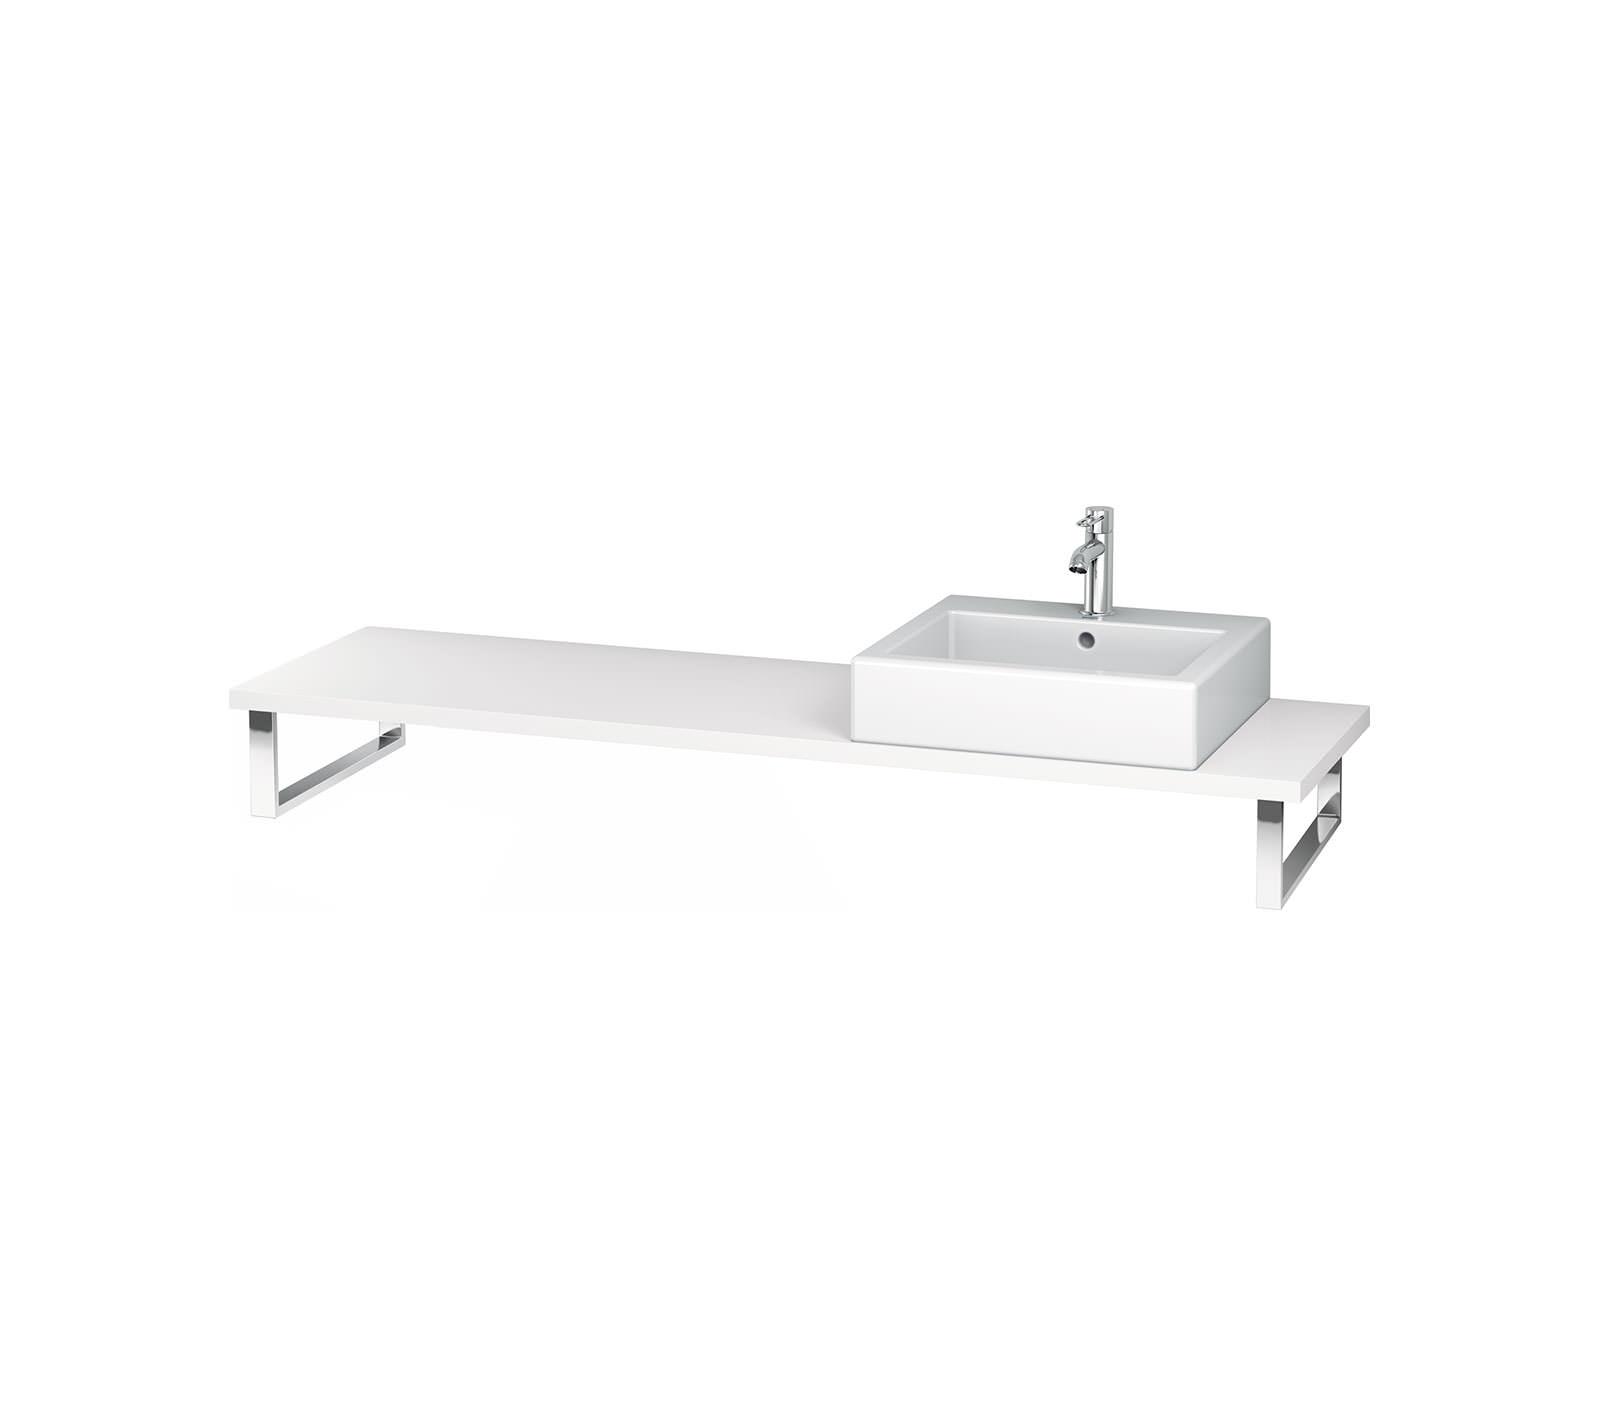 duravit l cube 800 x 550mm white matt 1 cut out console lc096001818. Black Bedroom Furniture Sets. Home Design Ideas